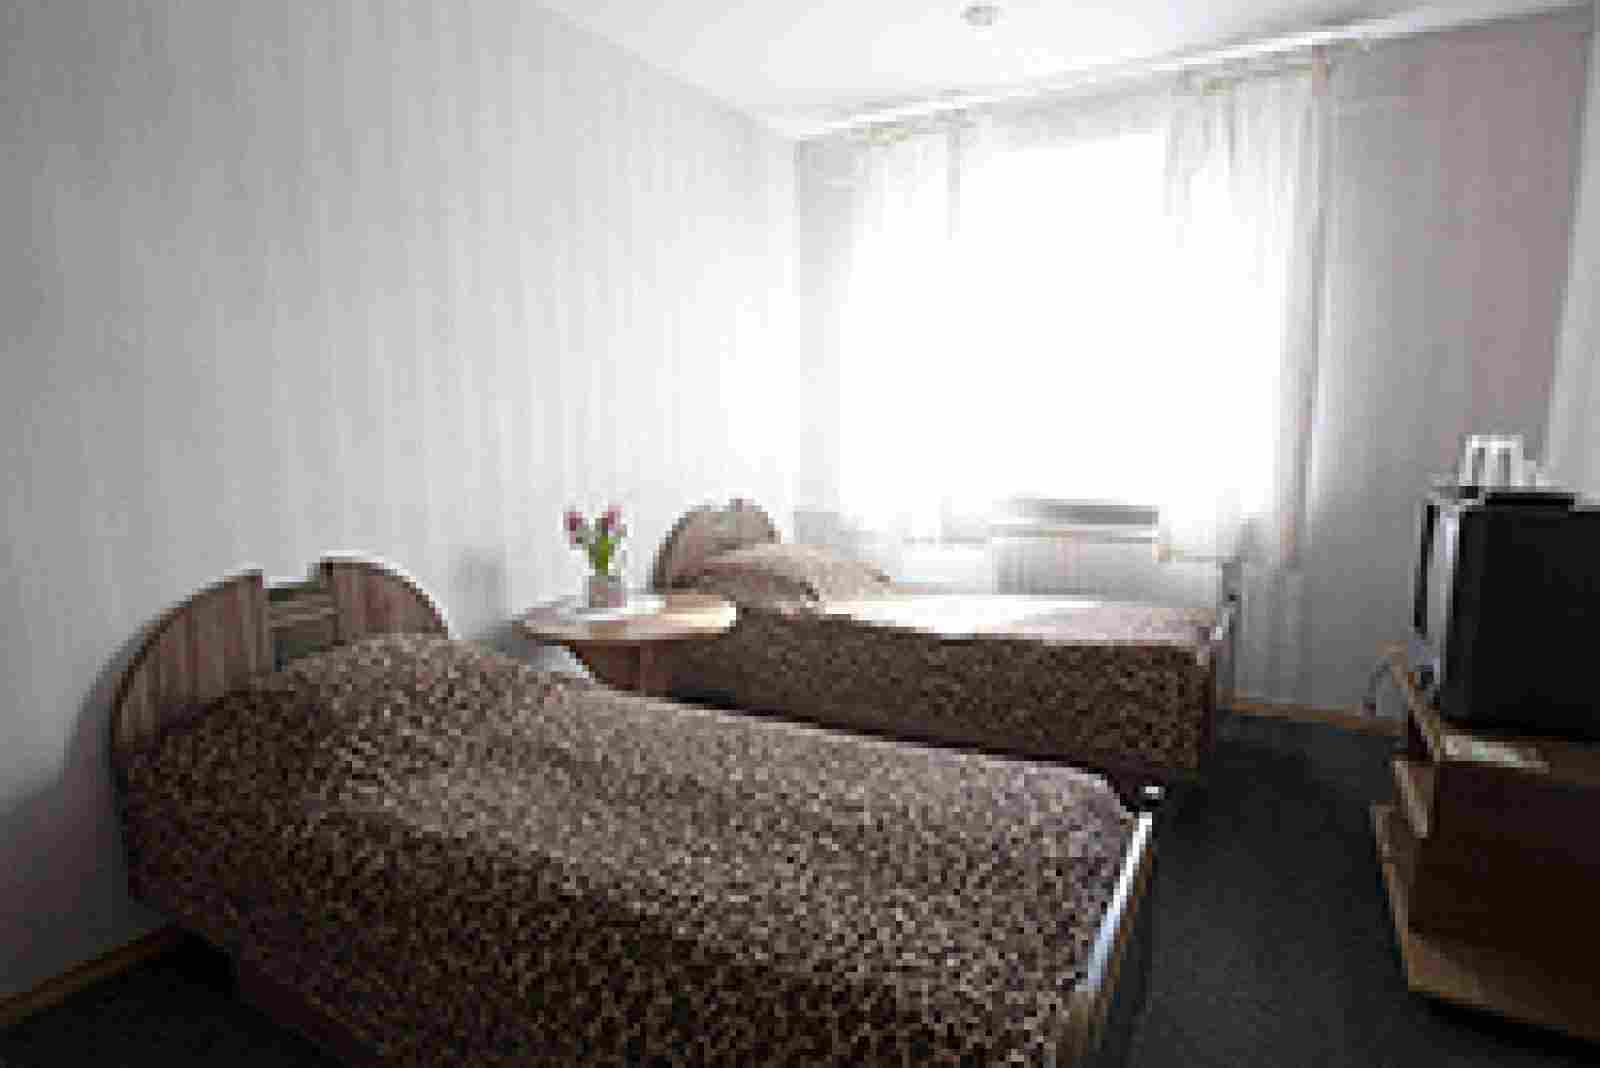 2-комнатная квартира по суткам в Речице от 45 тыс. за 1 чел. в сутки